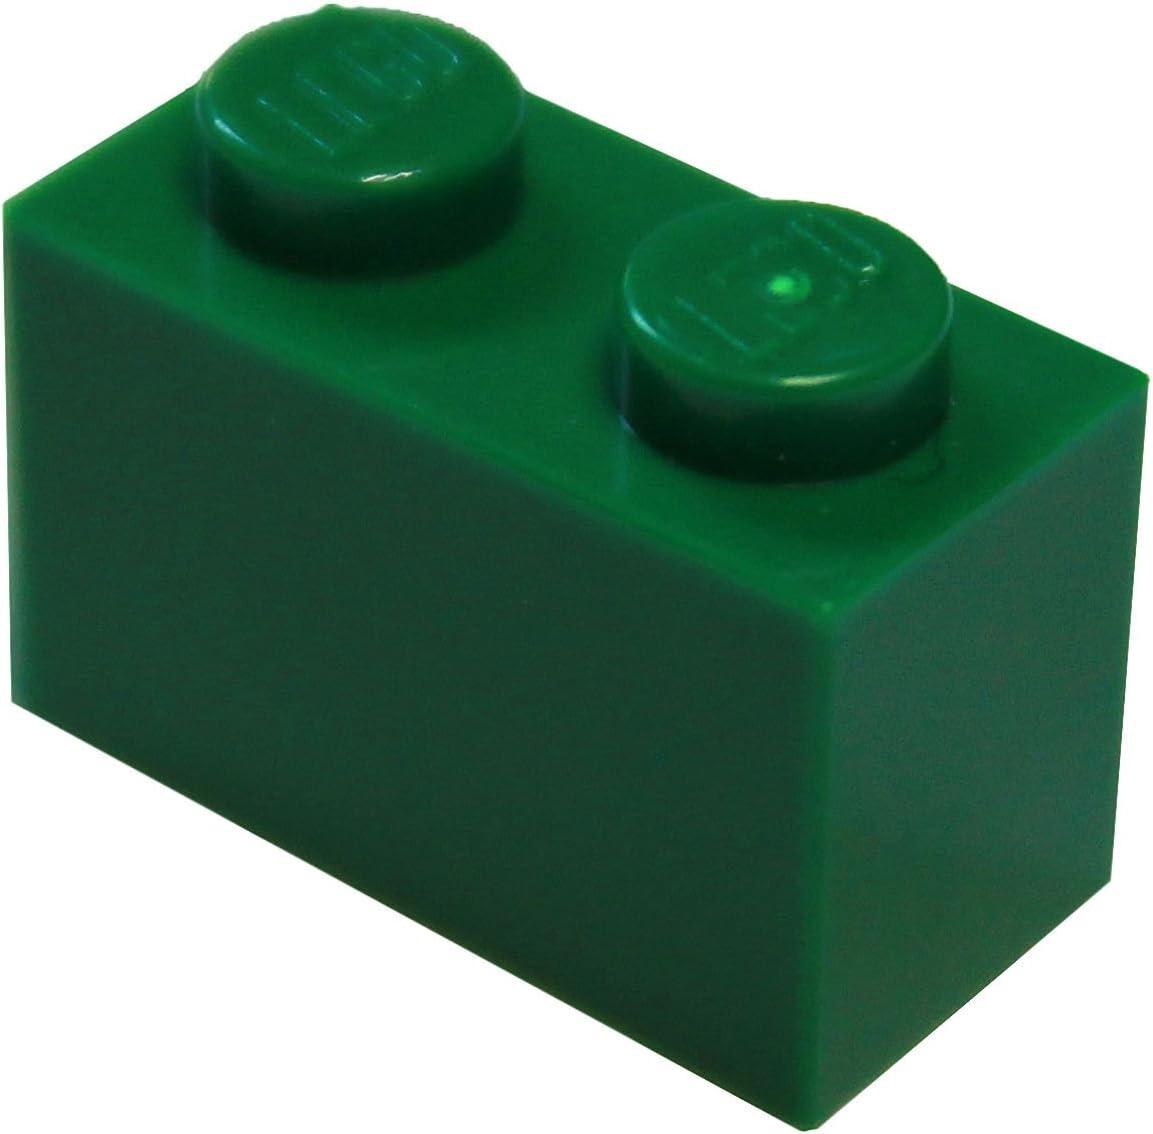 LEGO Parts and Pieces: Green (Dark Green) 1x2 Brick x50